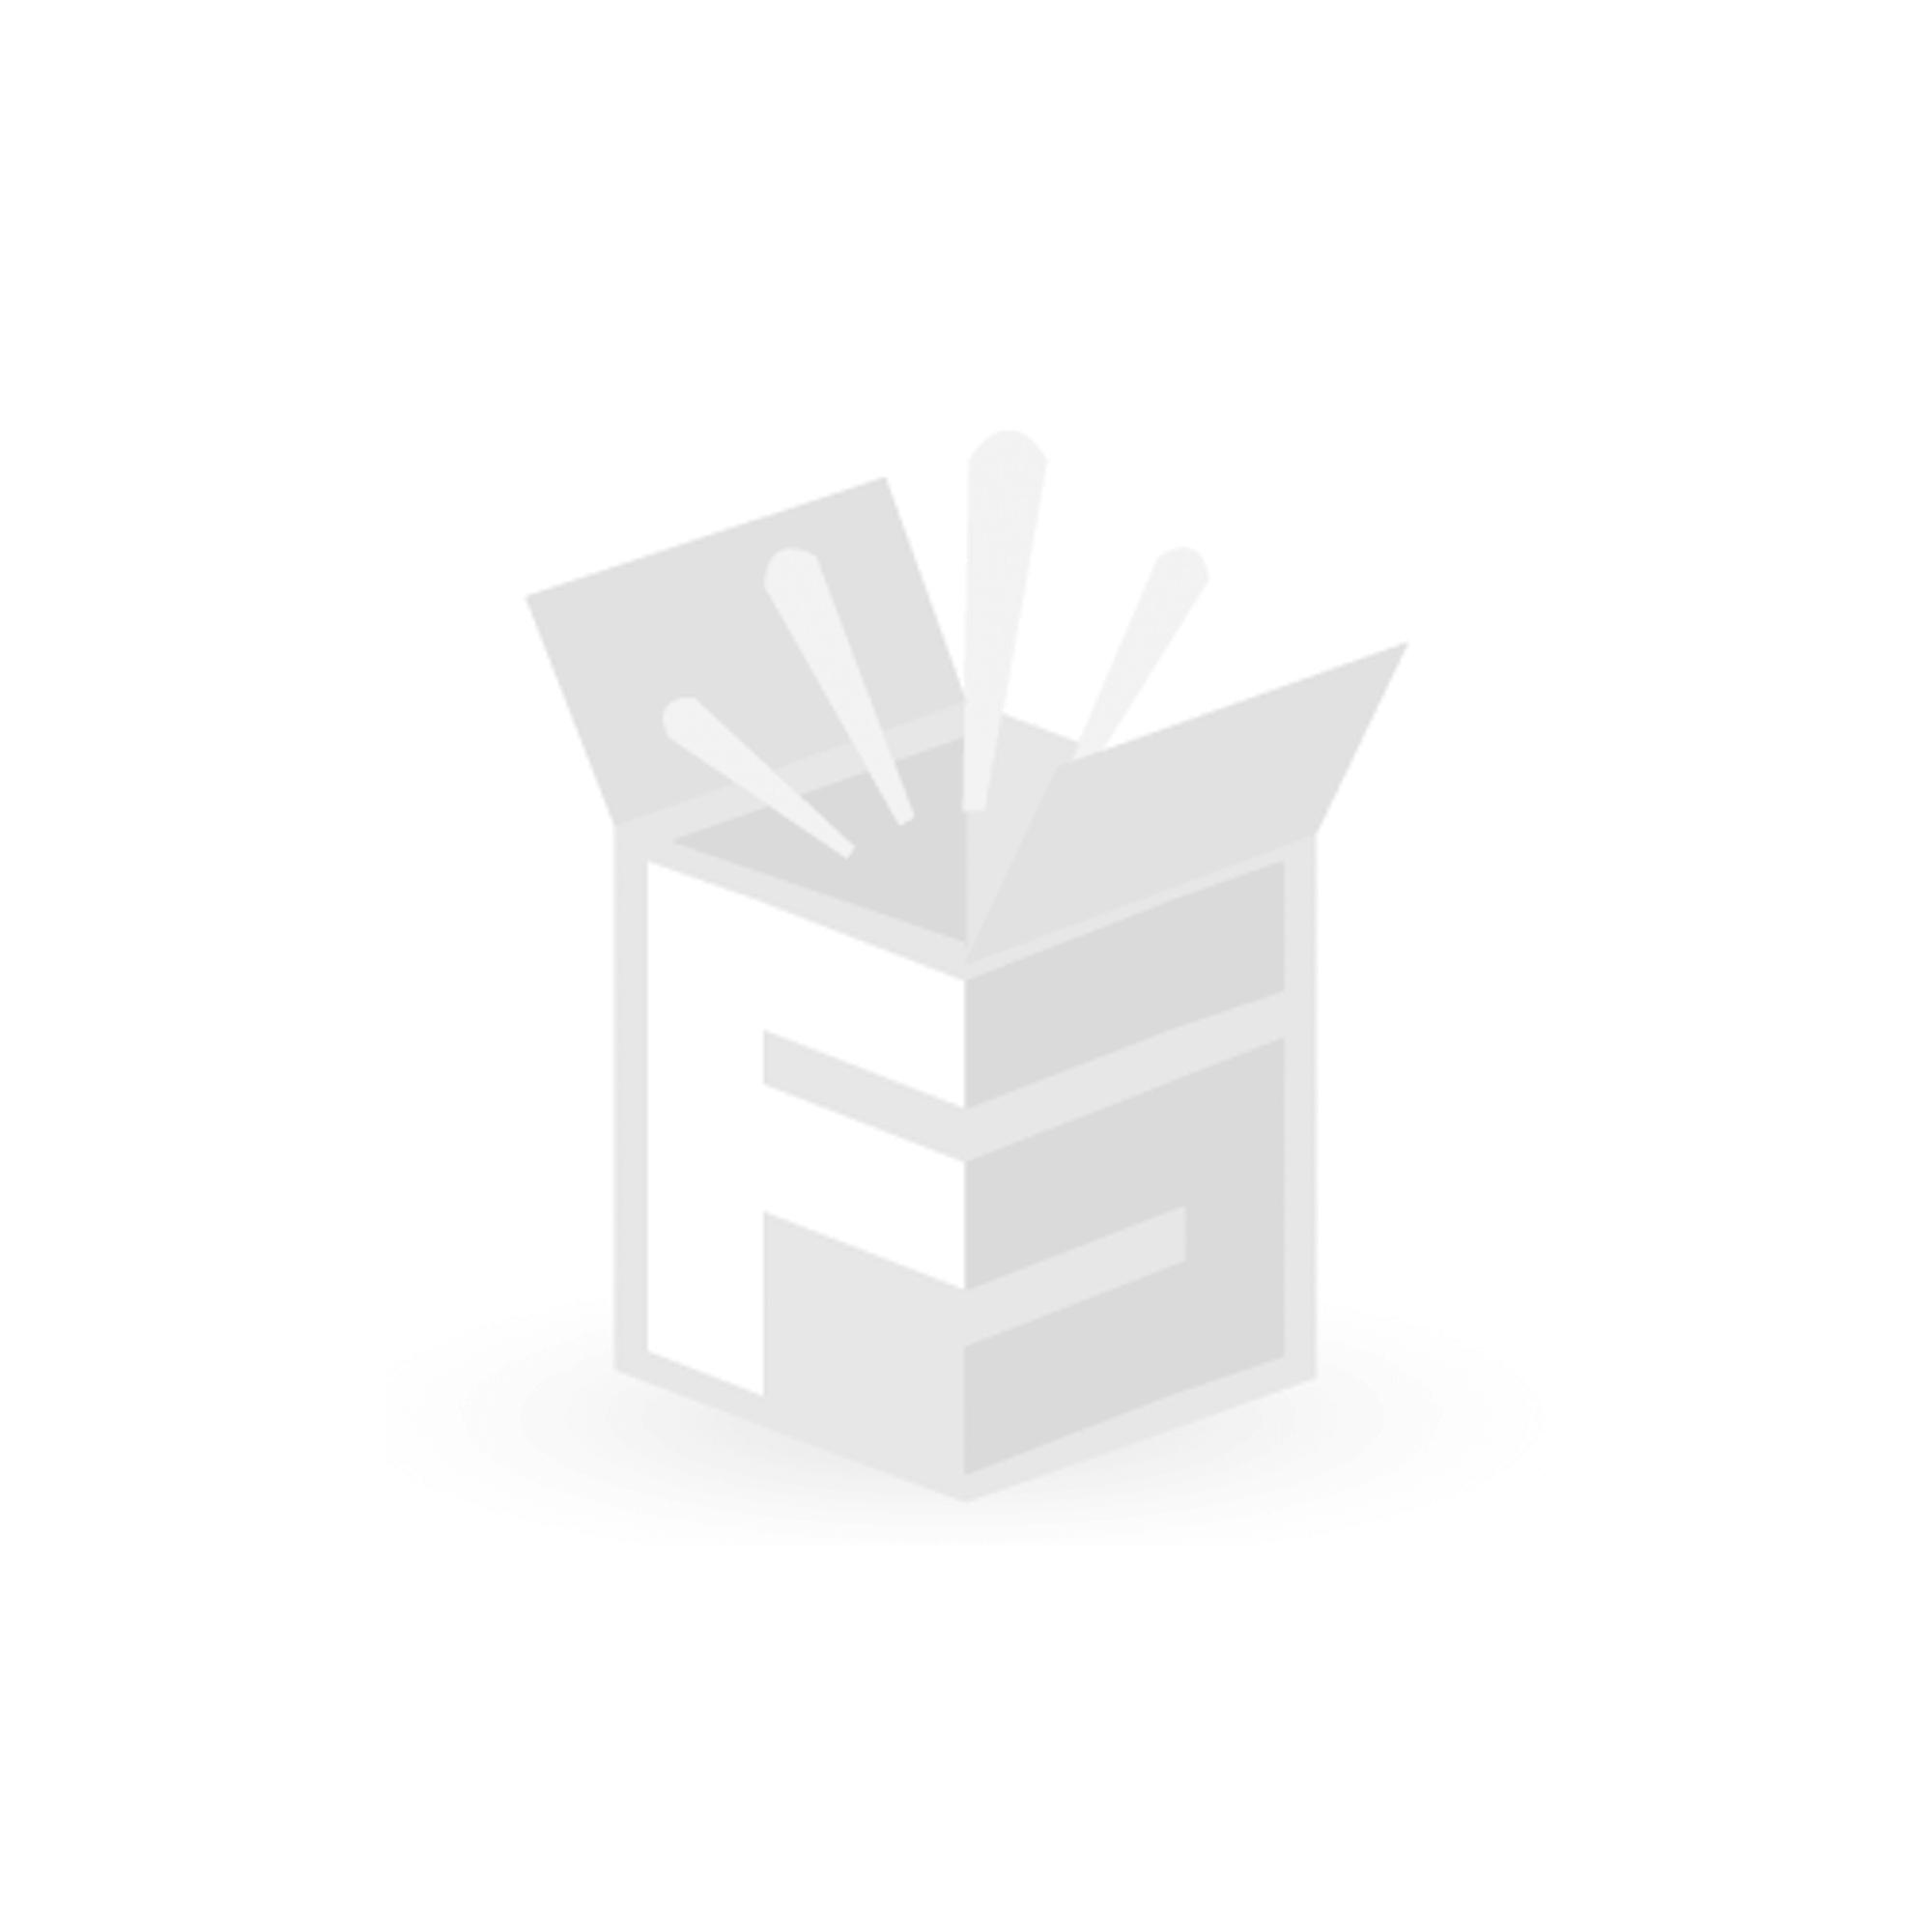 FS-STAR Tellerset, 6 Stück Teller aus Palmblatt